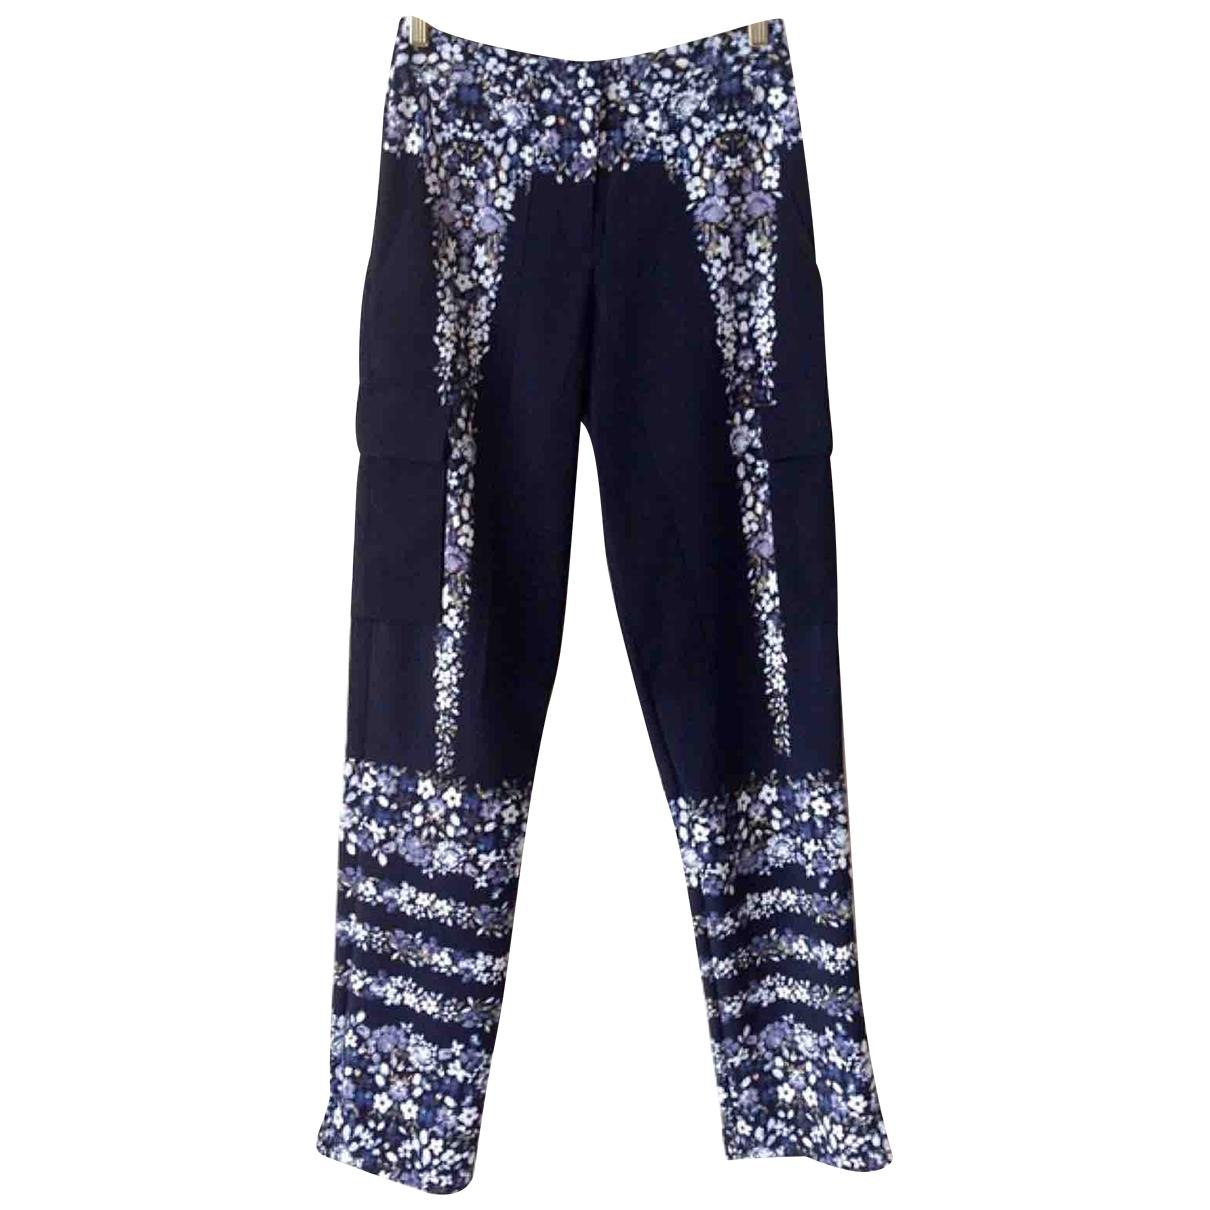 Bcbg Max Azria \N Black Trousers for Women XXS International